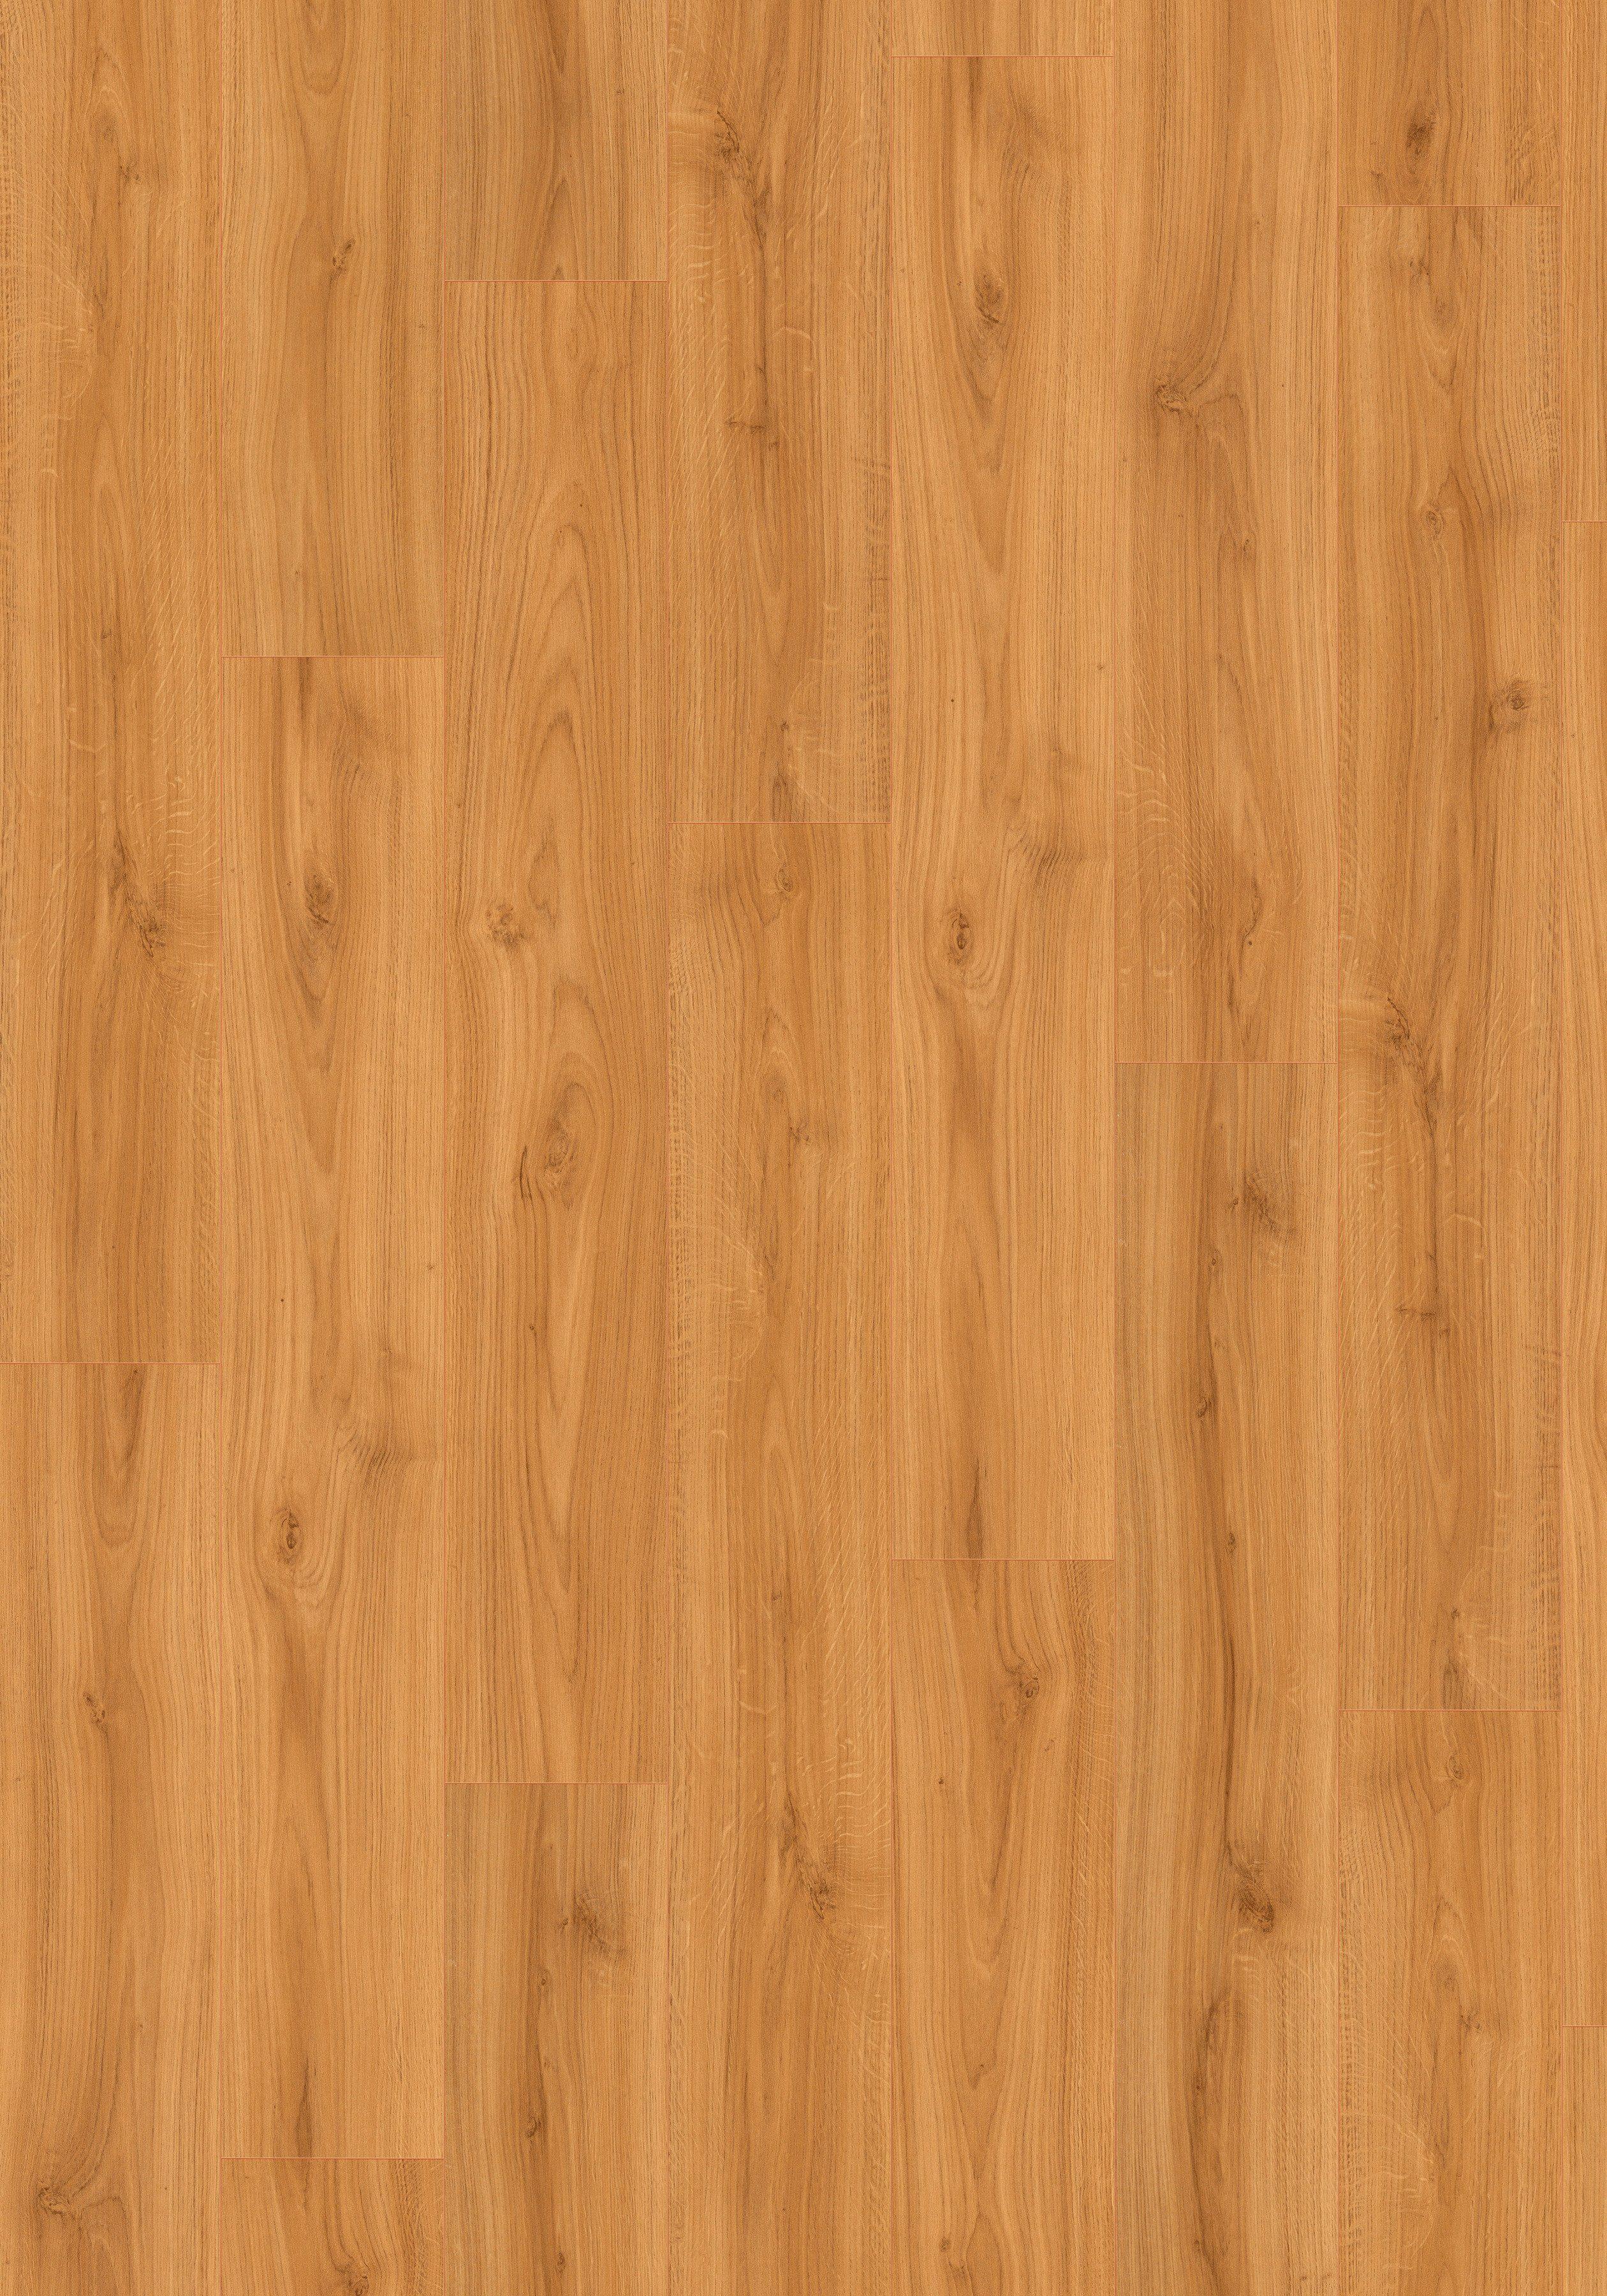 Megafloor Sockelleisten passend zum Korkpluslaminat »Megafloor cork+«, allee natur Nachbildung